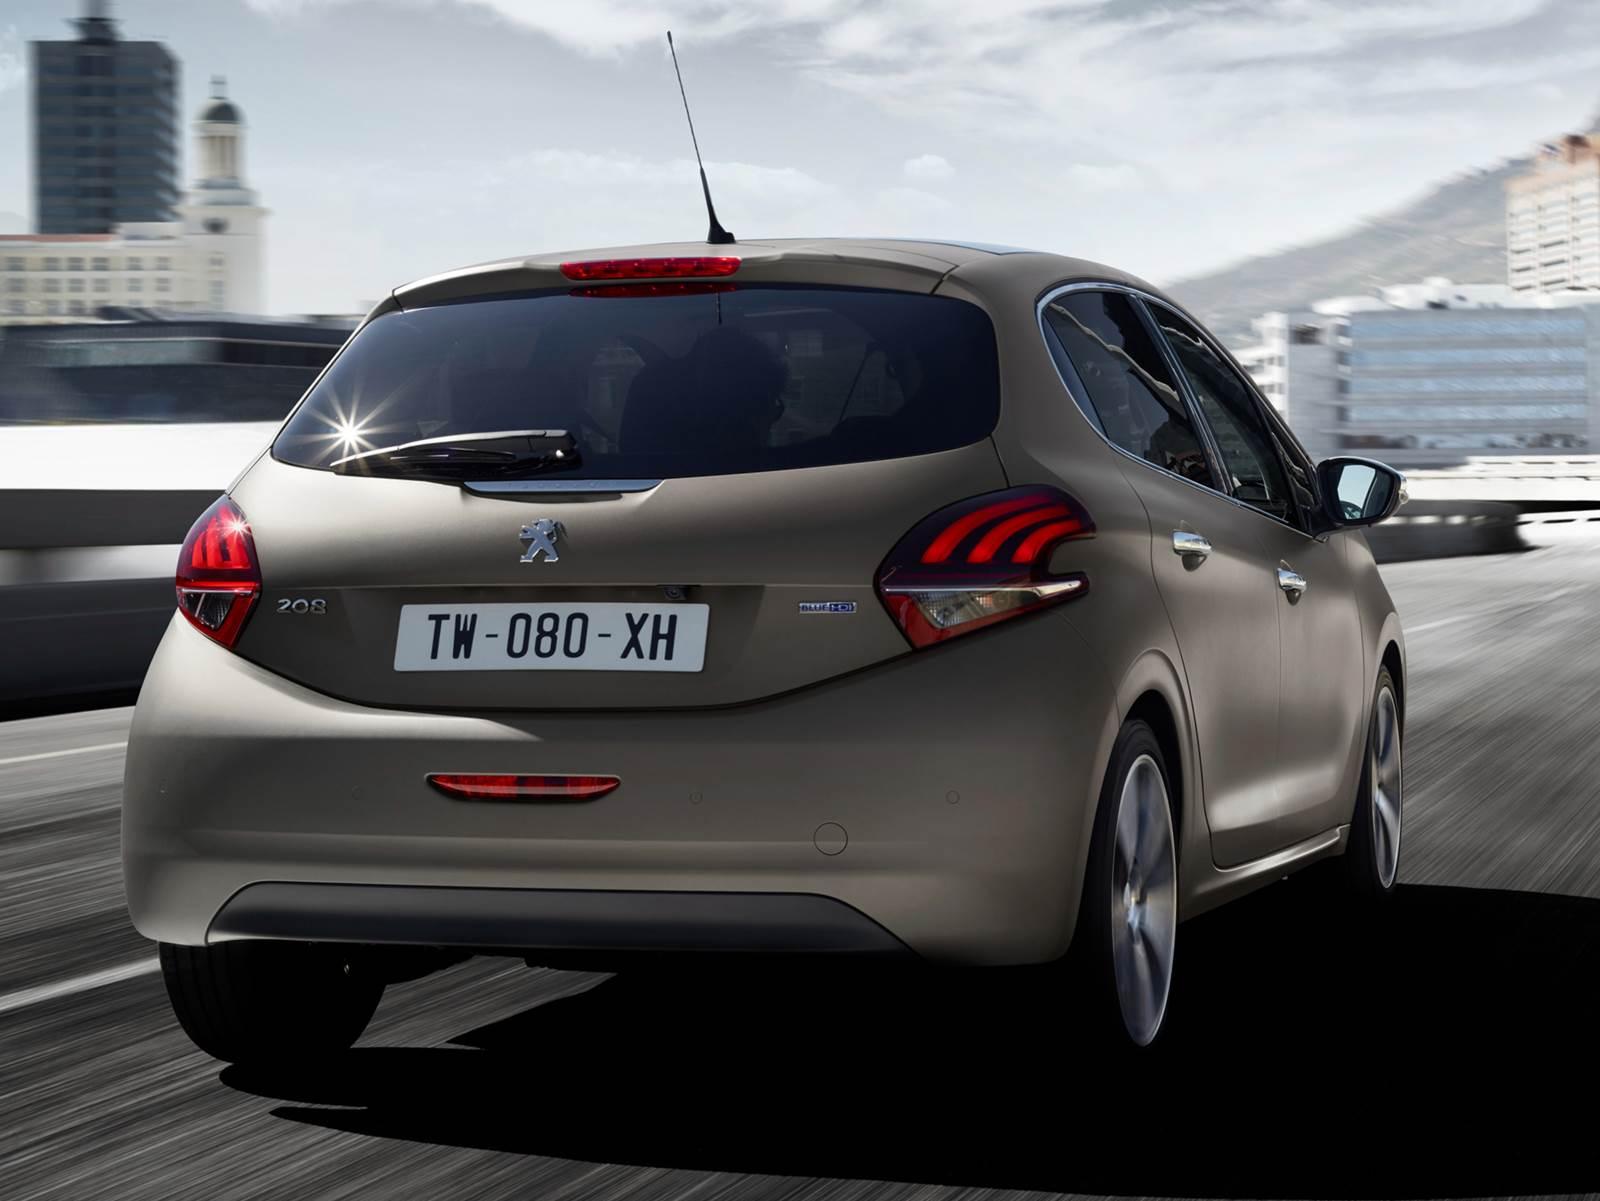 Novo Peugeot 208 - Ice Silver - fosco